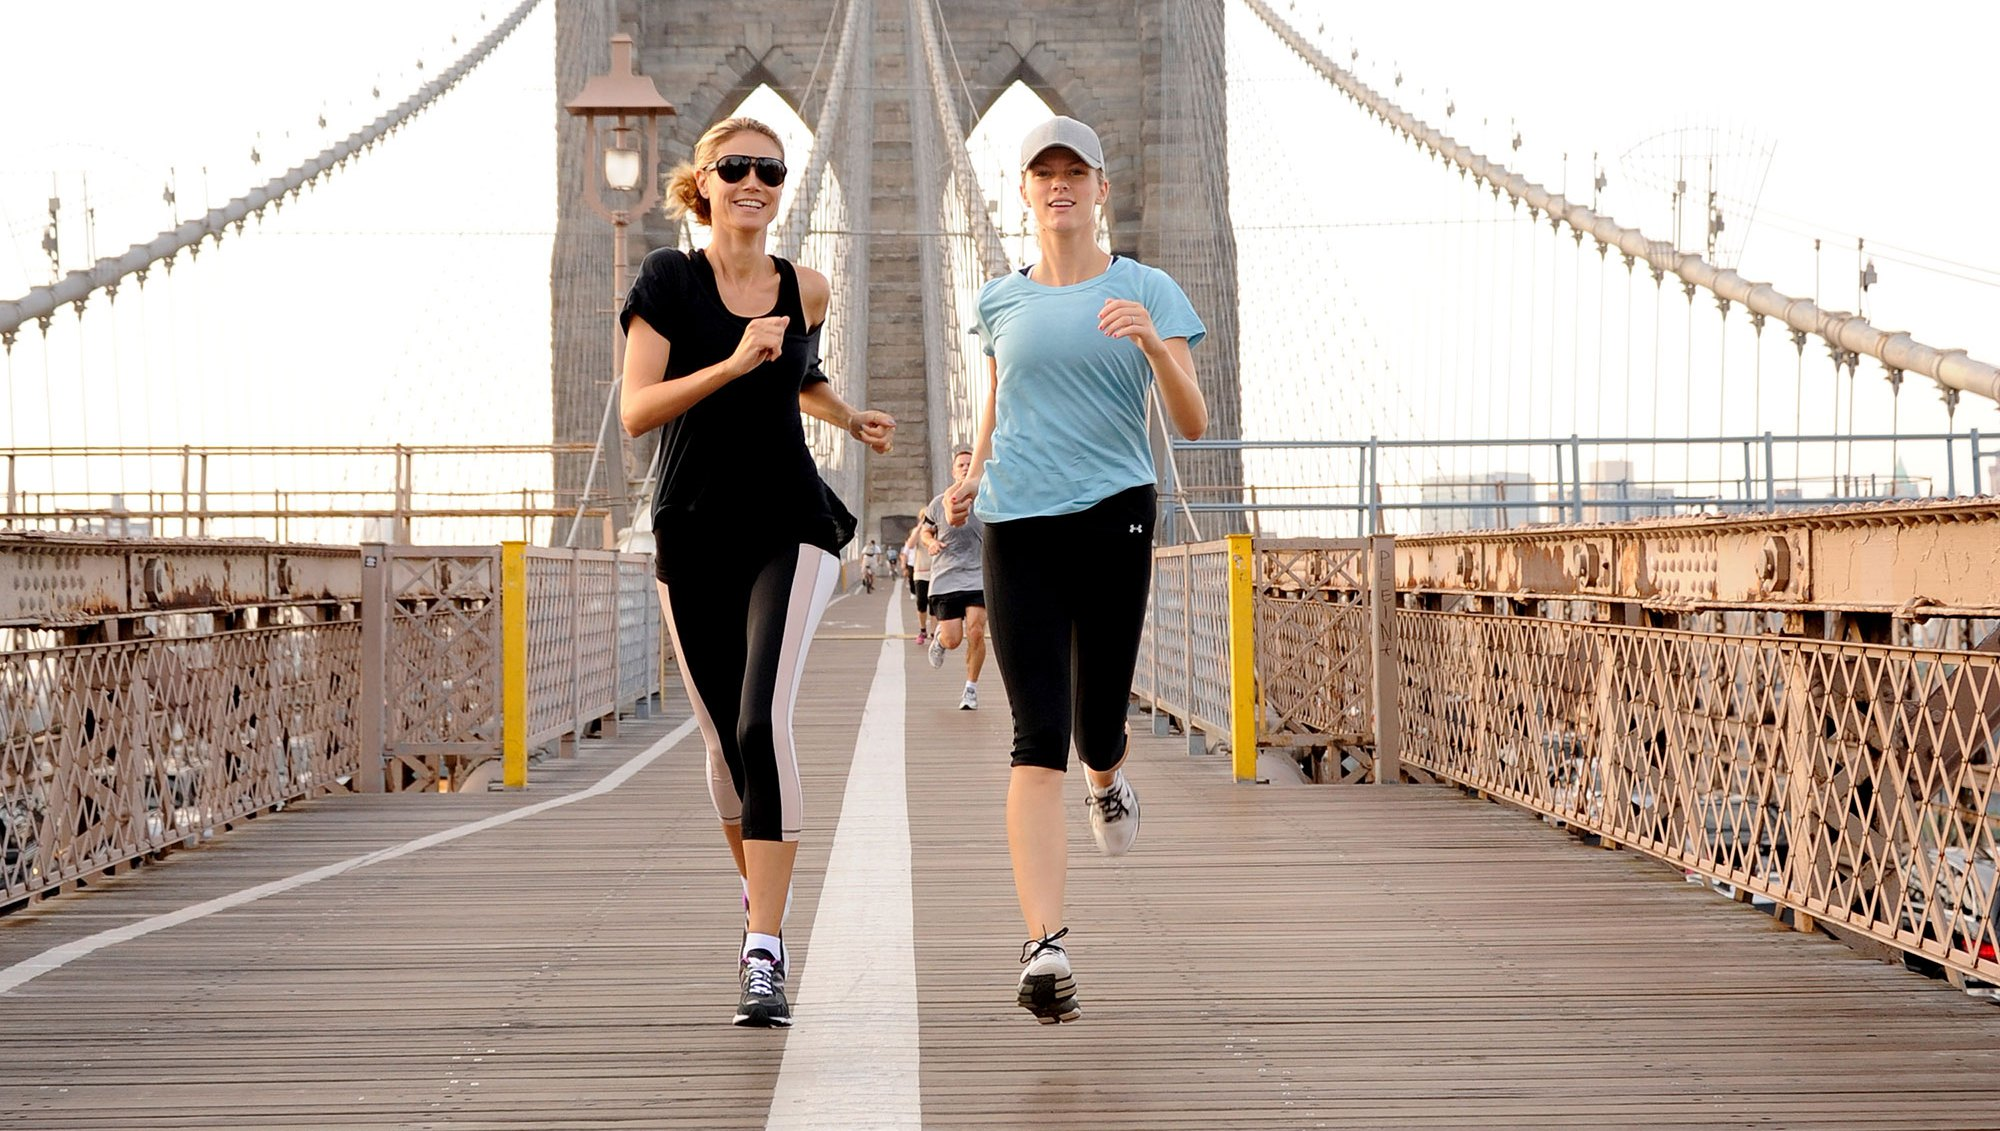 Brooklyn Decker Heidi Klum Celebrity Joggers